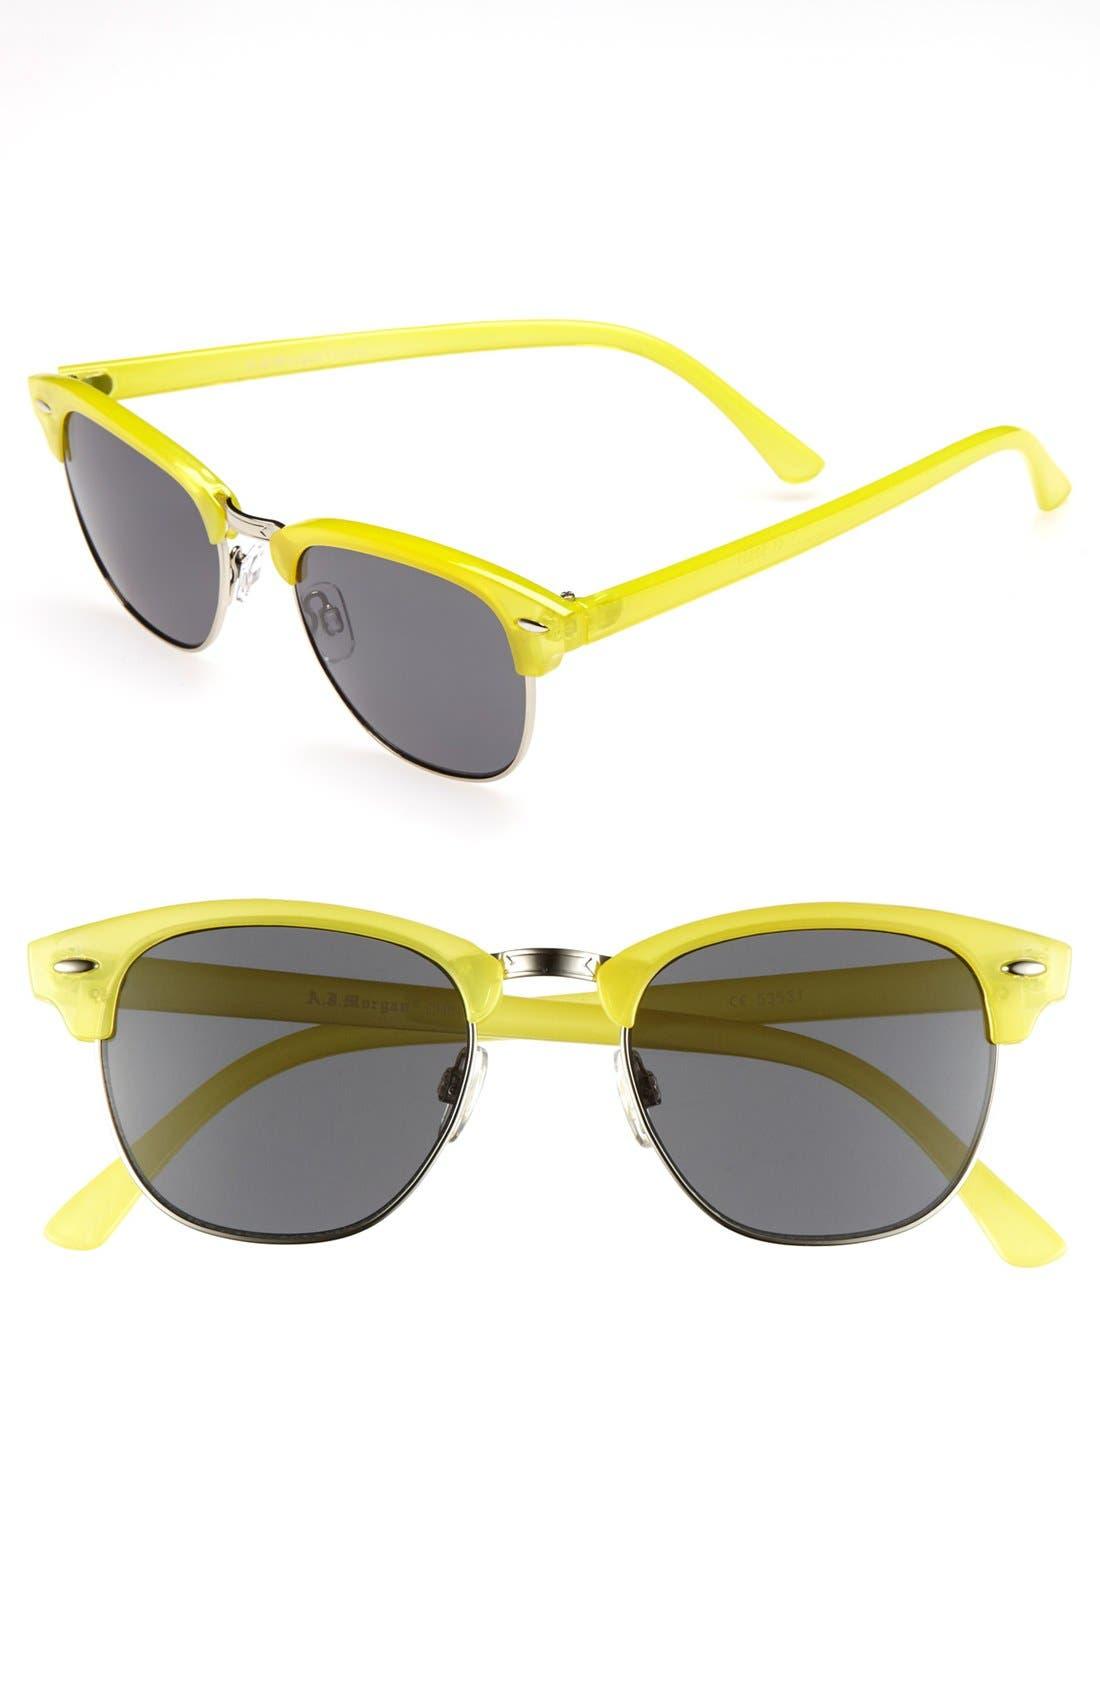 Alternate Image 1 Selected - A.J. Morgan 'Sorbet' Sunglasses